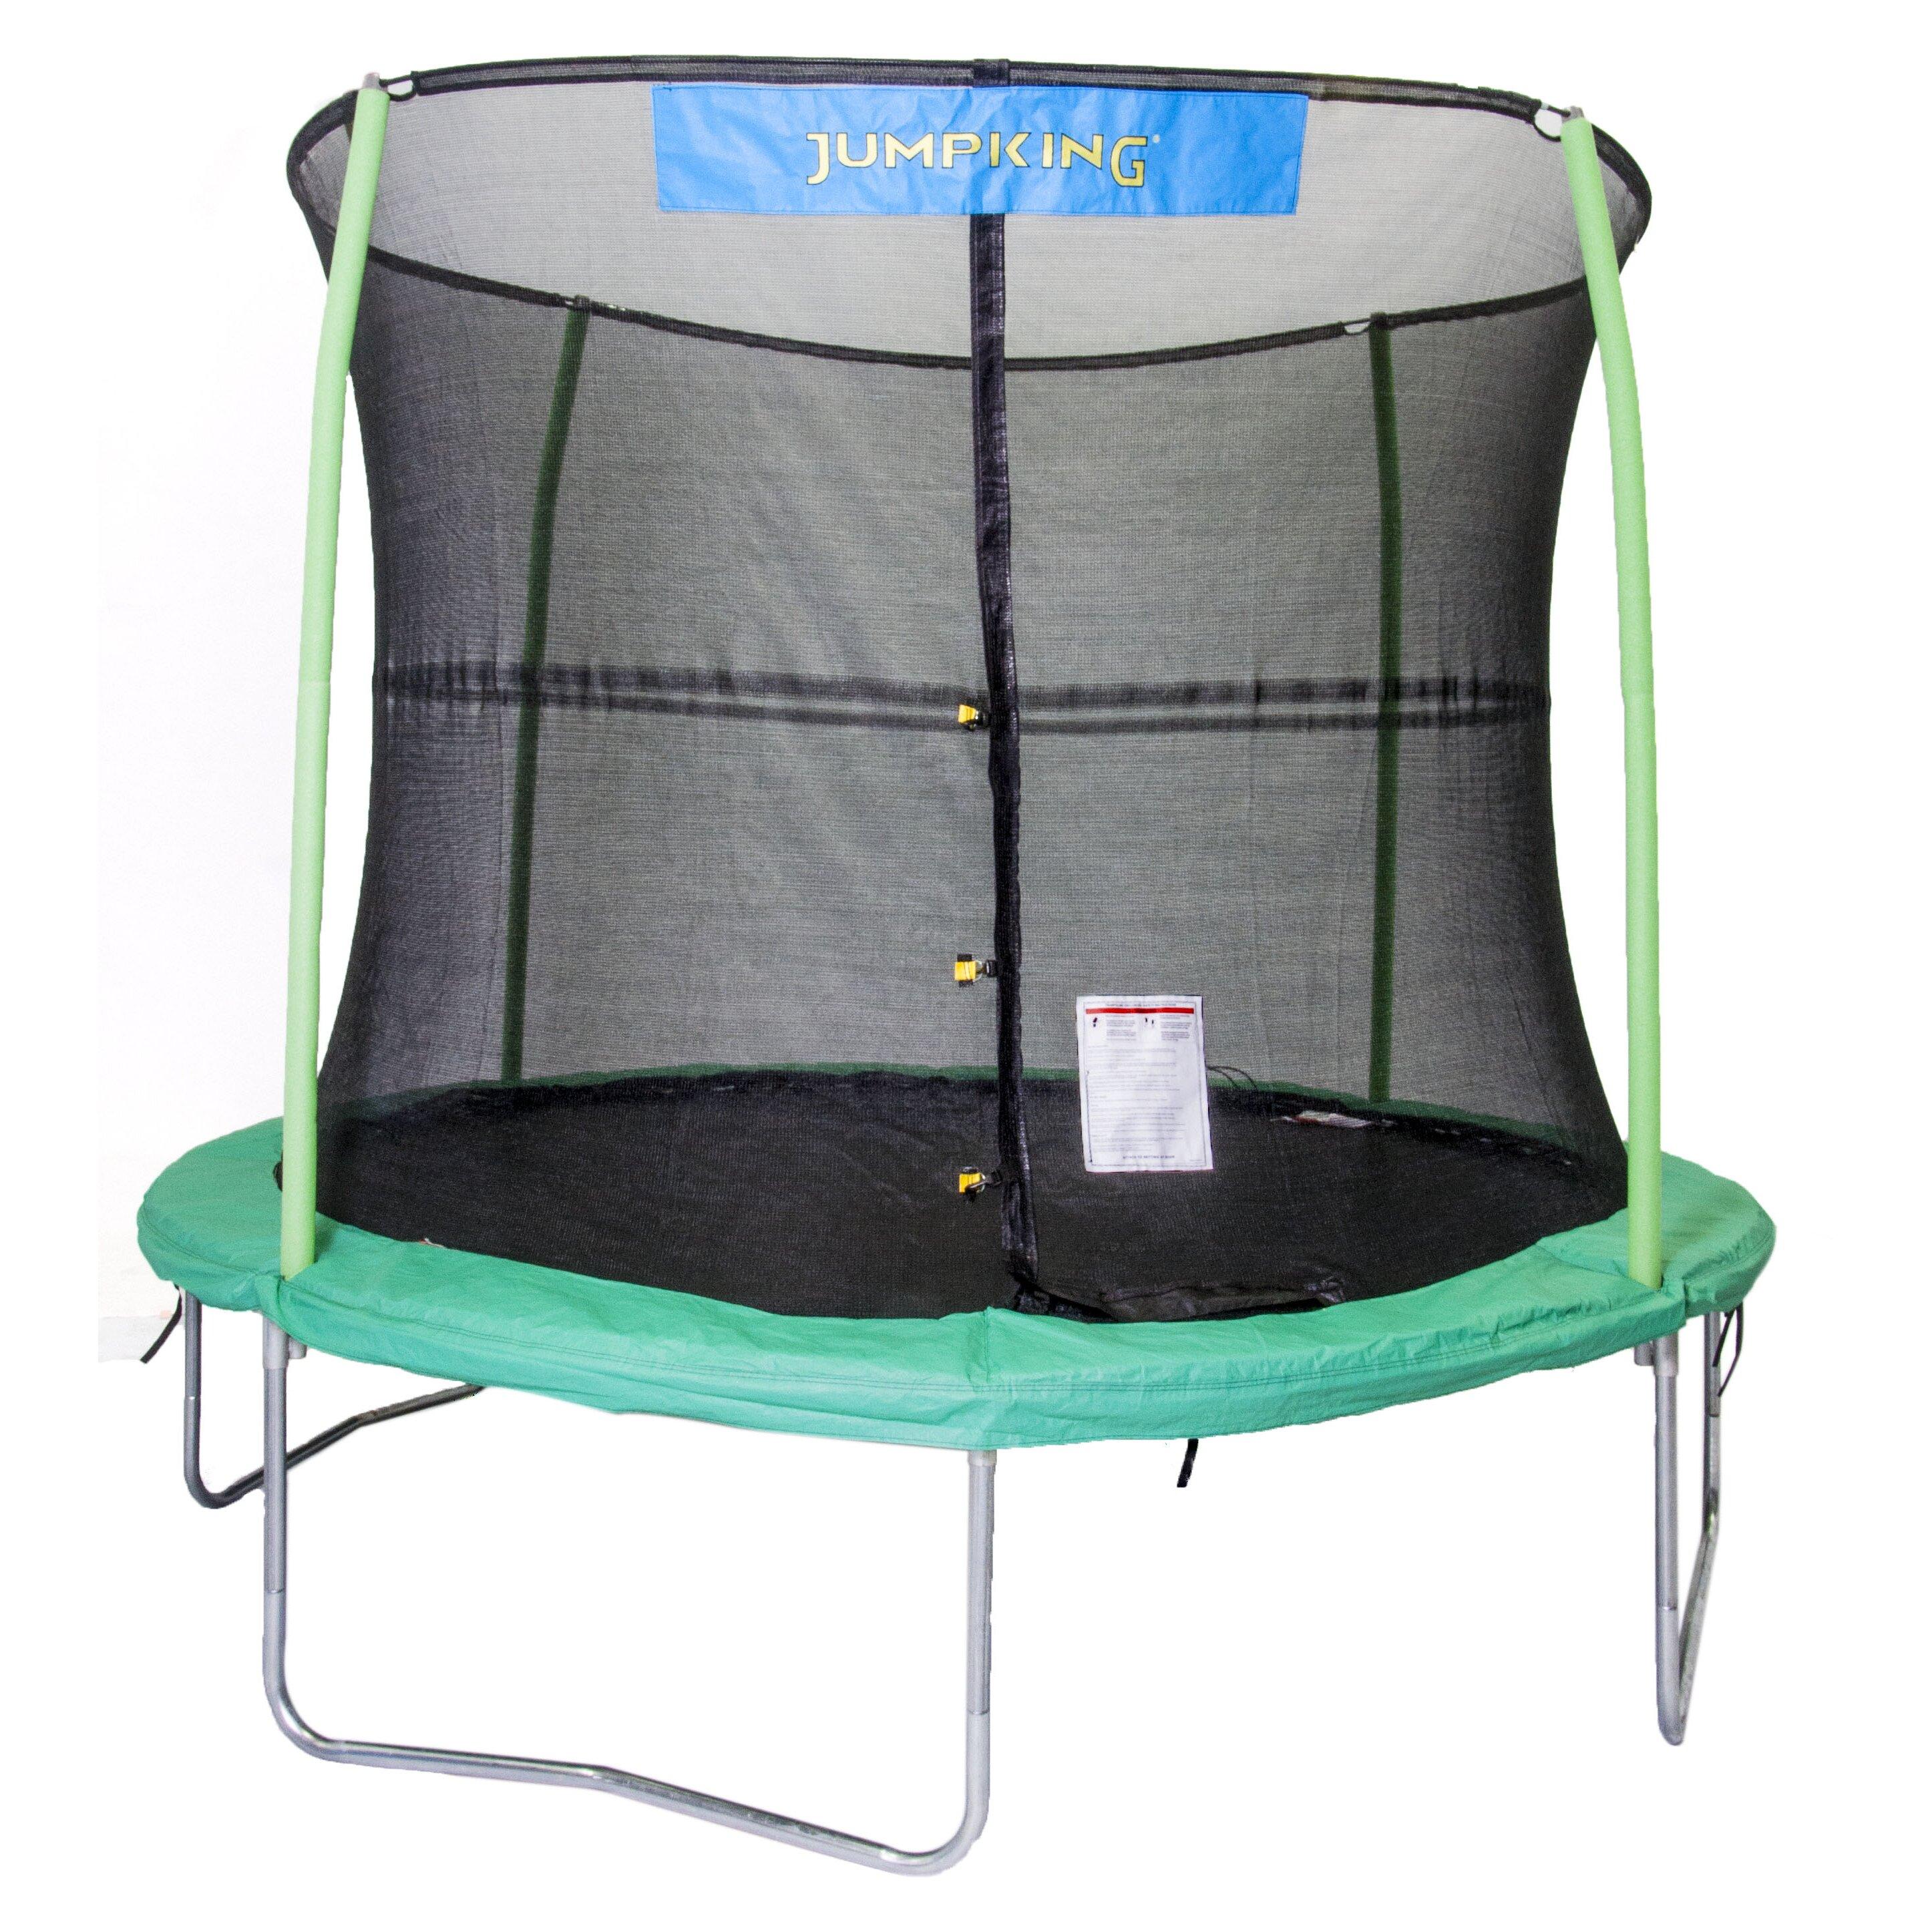 Jumpking 10' Enclosure For Trampoline